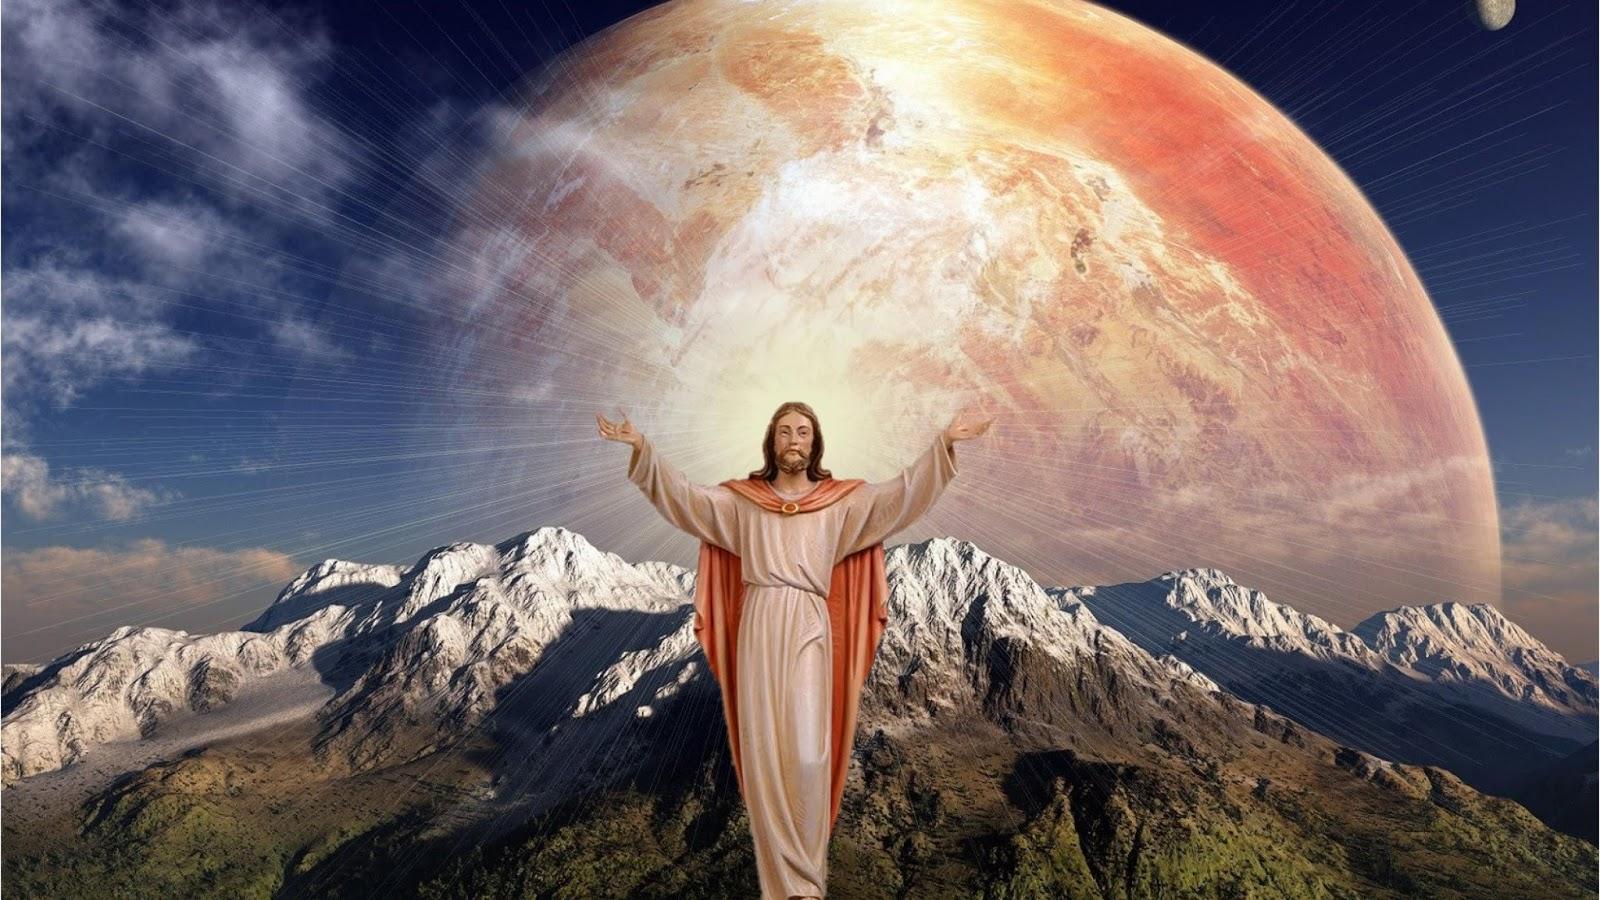 Jesus Images | Pictures of Jesus Christ | Photos Wallpaper ...